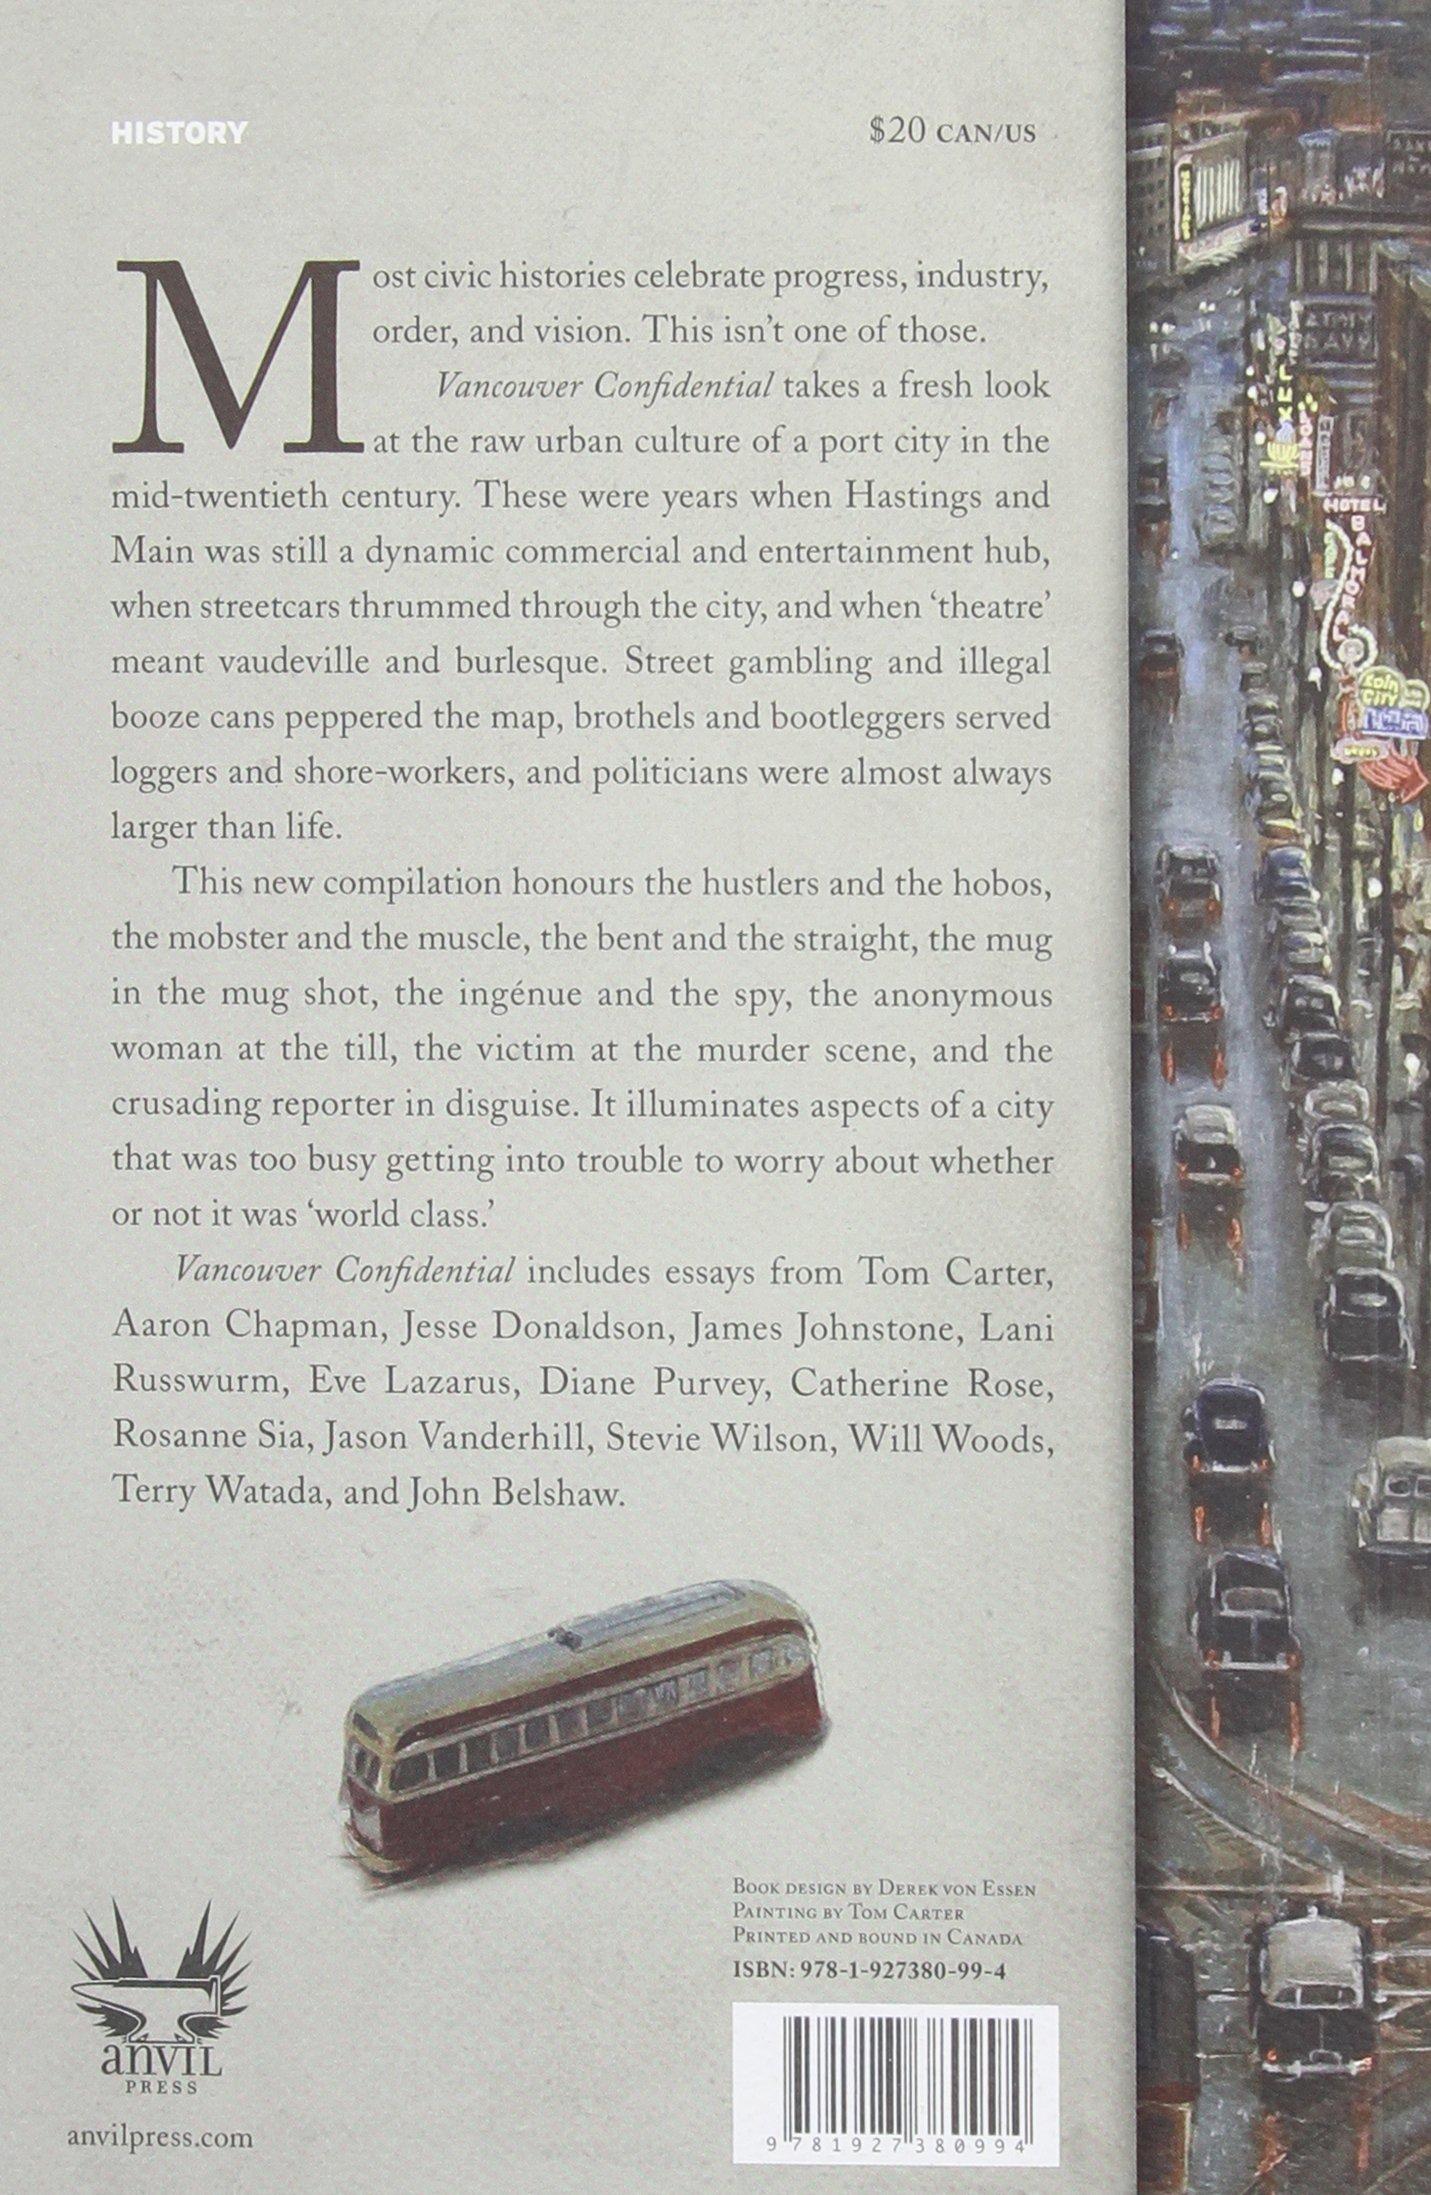 vancouver confidential john belshaw books